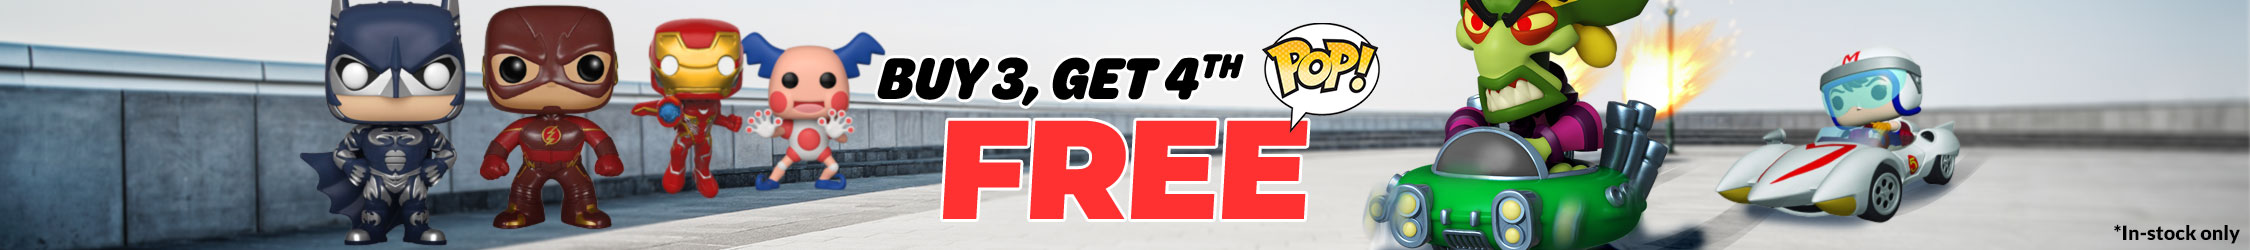 Funko Buy 3 Get 4th Free